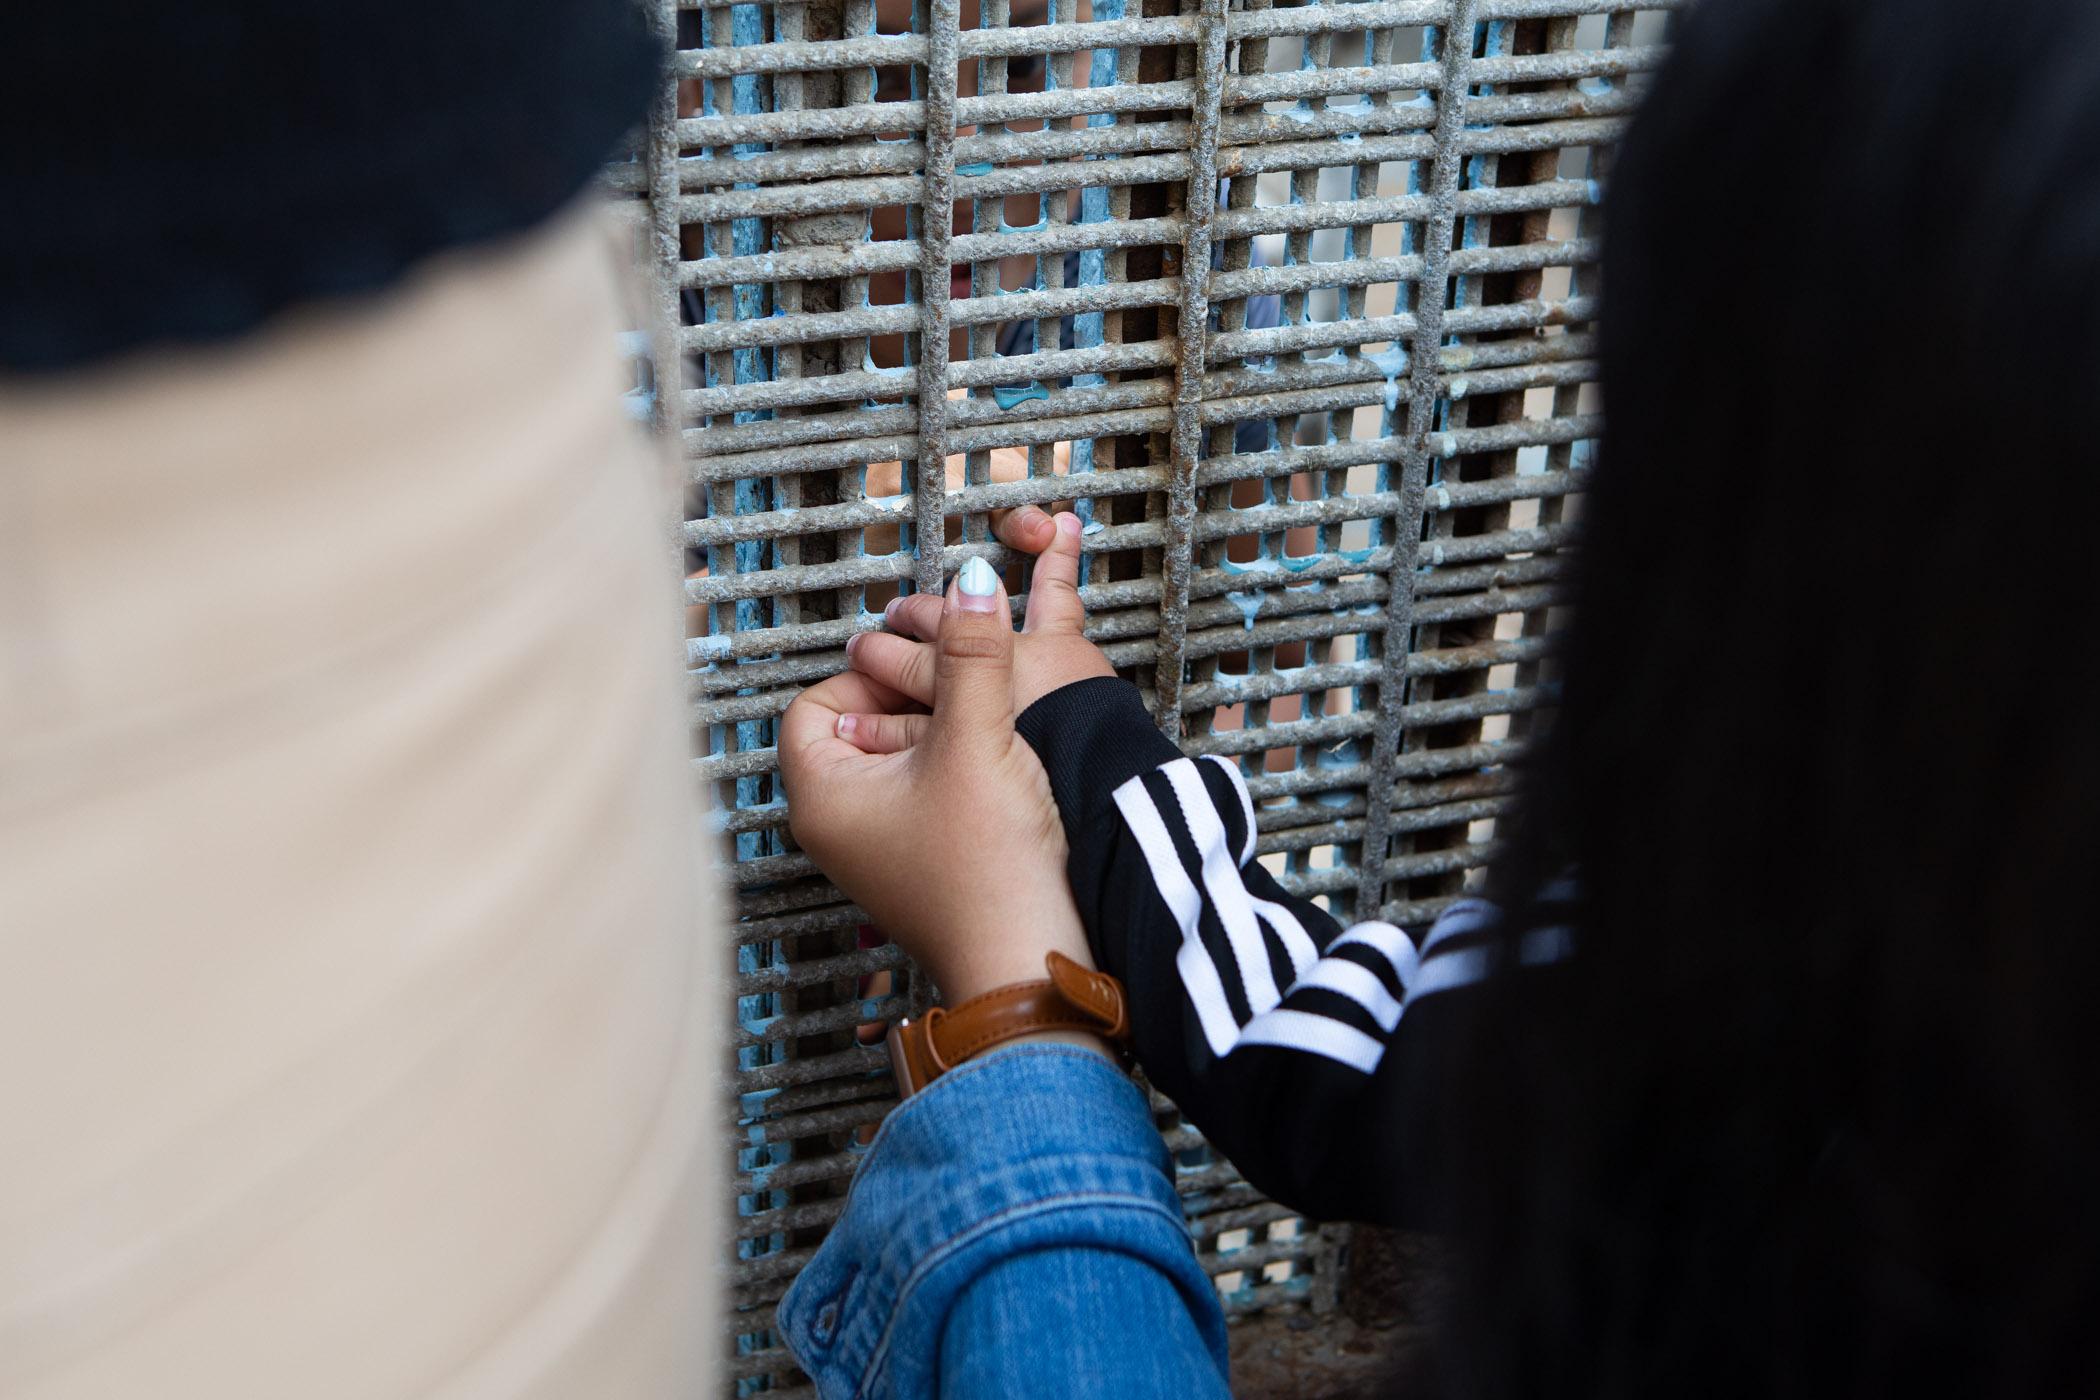 Tijuana Border Fence for NYT Student Journeys